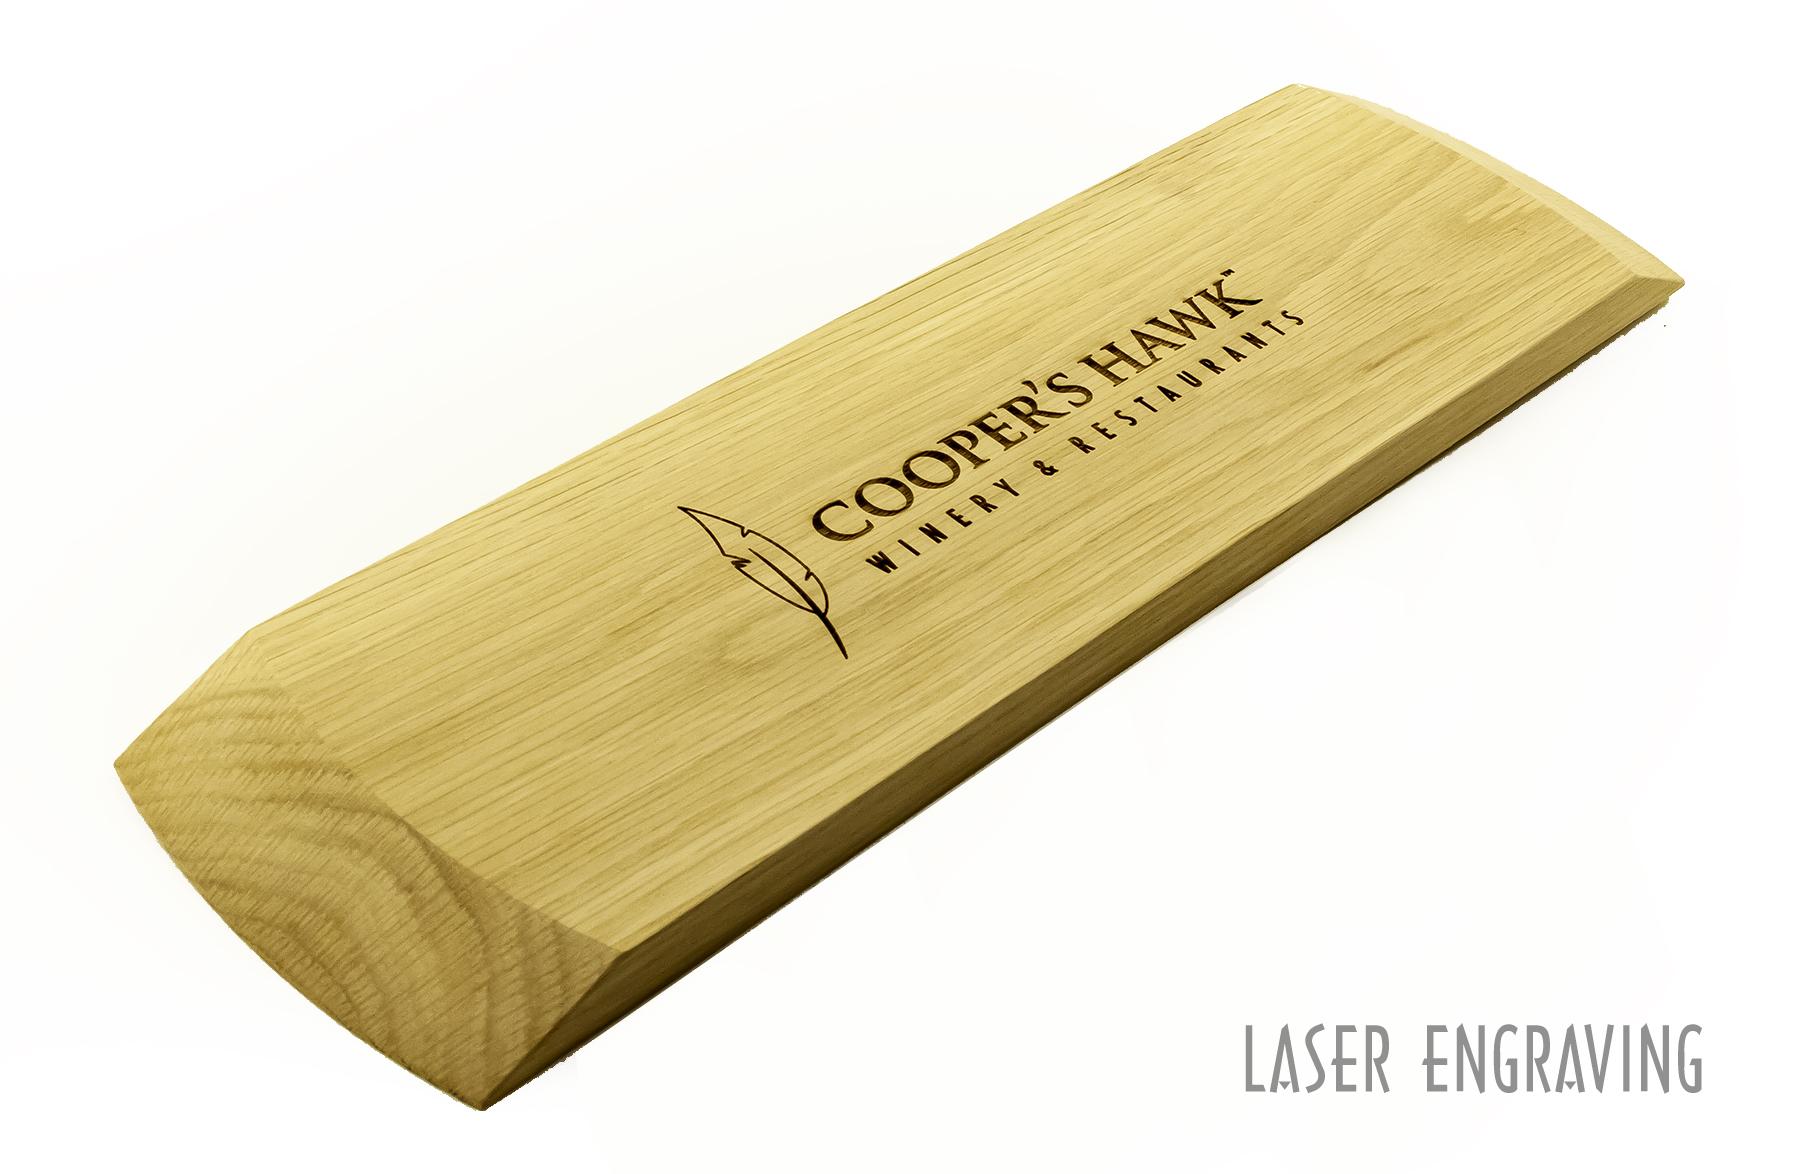 Wood Board Laser Engraving